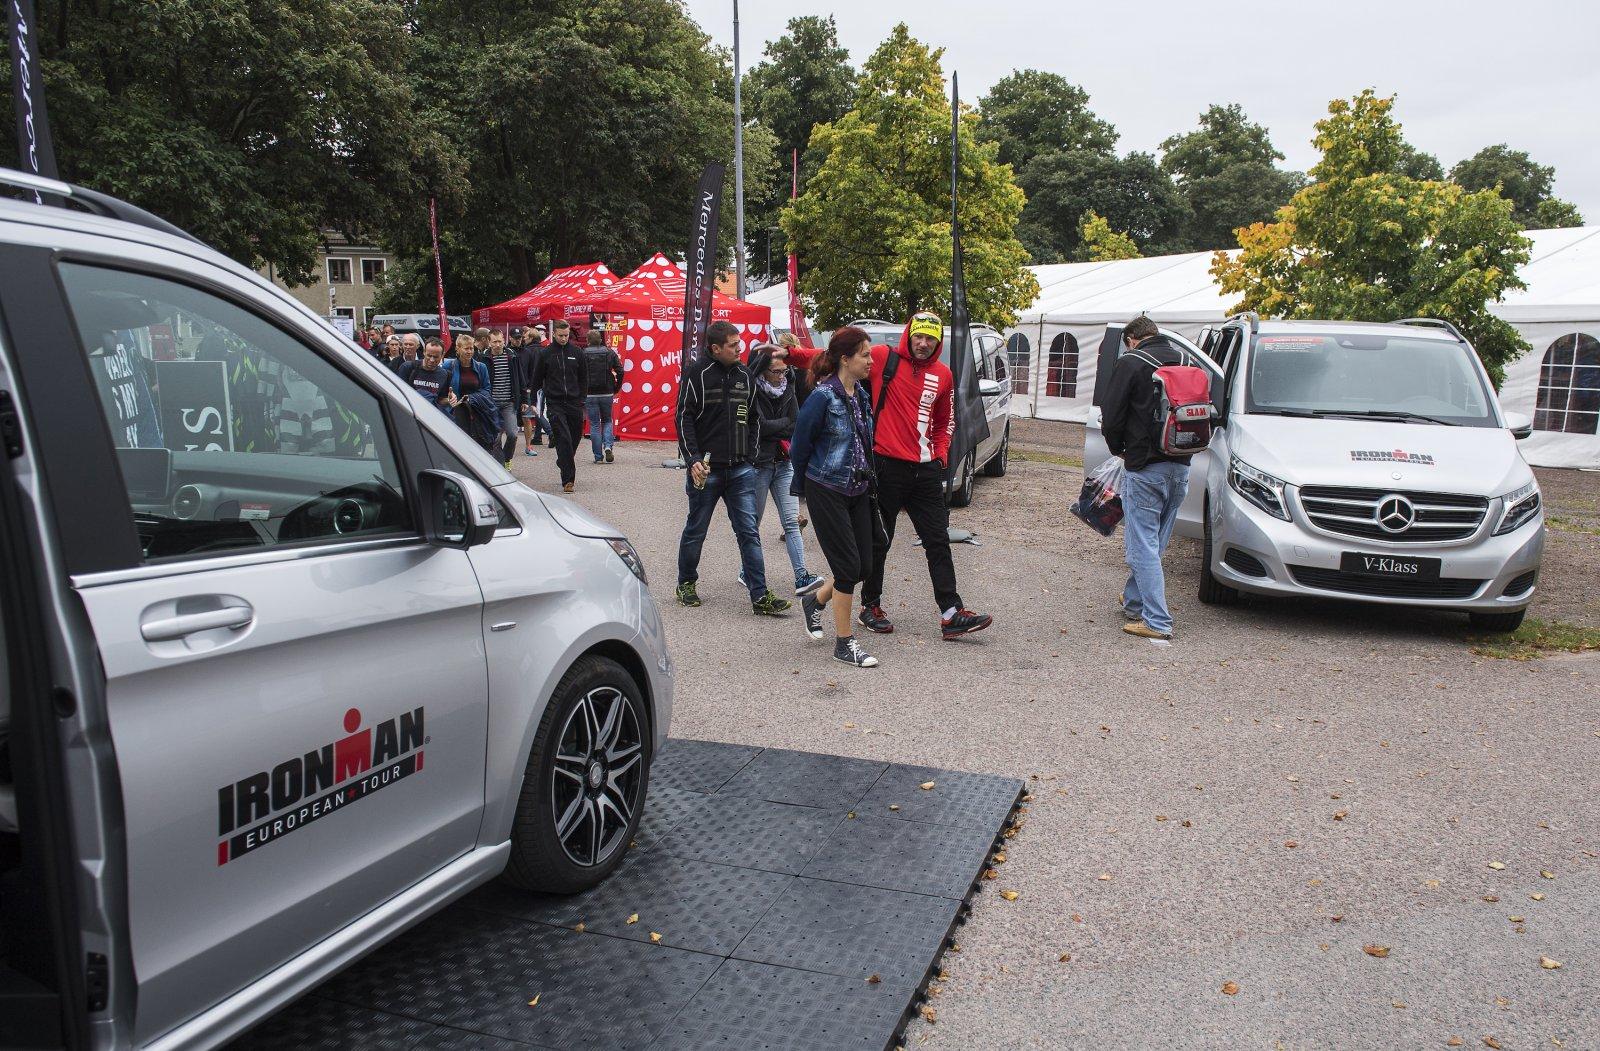 20160817 KALMAR. Fotografering av Mercedes marknadsaktiviteter samt Åsa Lundström under Mini-Tri i Kalmar. Foto:SUVAD MRKONJIC Code10042